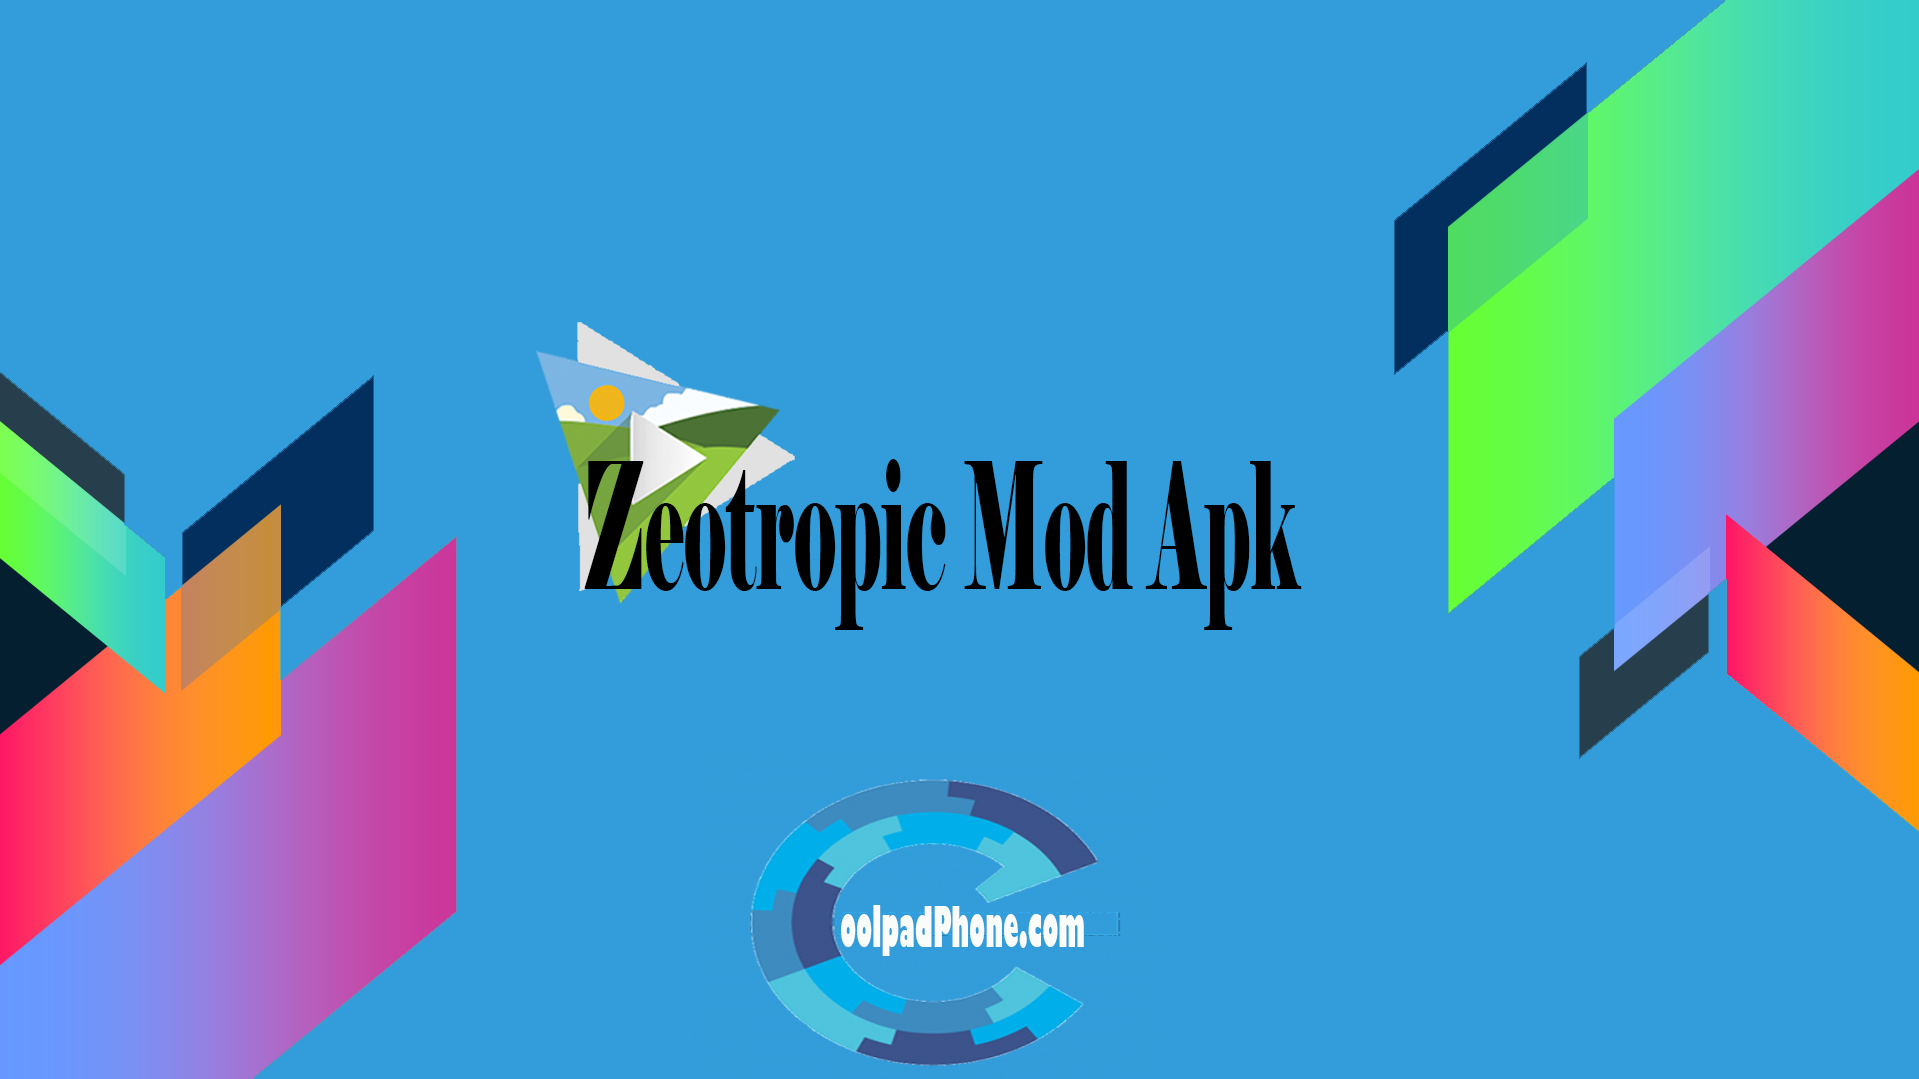 Zeotropic Mod Apk